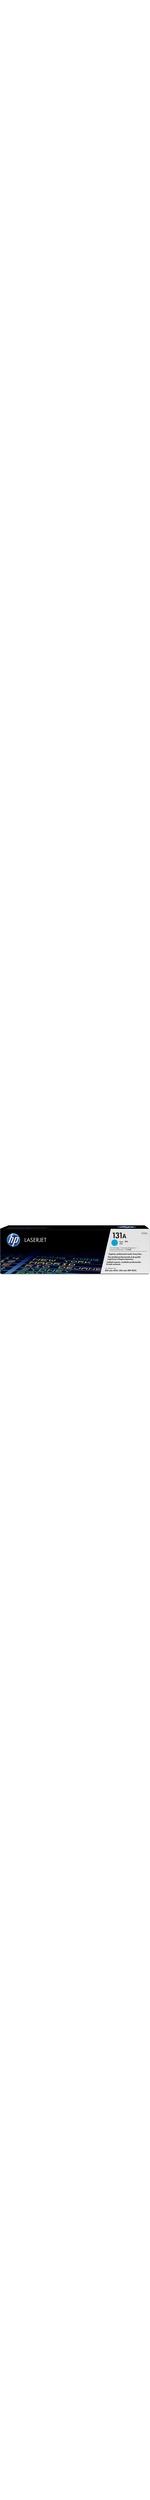 HP 131A Toner Cartridge - Cyan - Laser - Standard Yield - 1800 Page - 1 Each